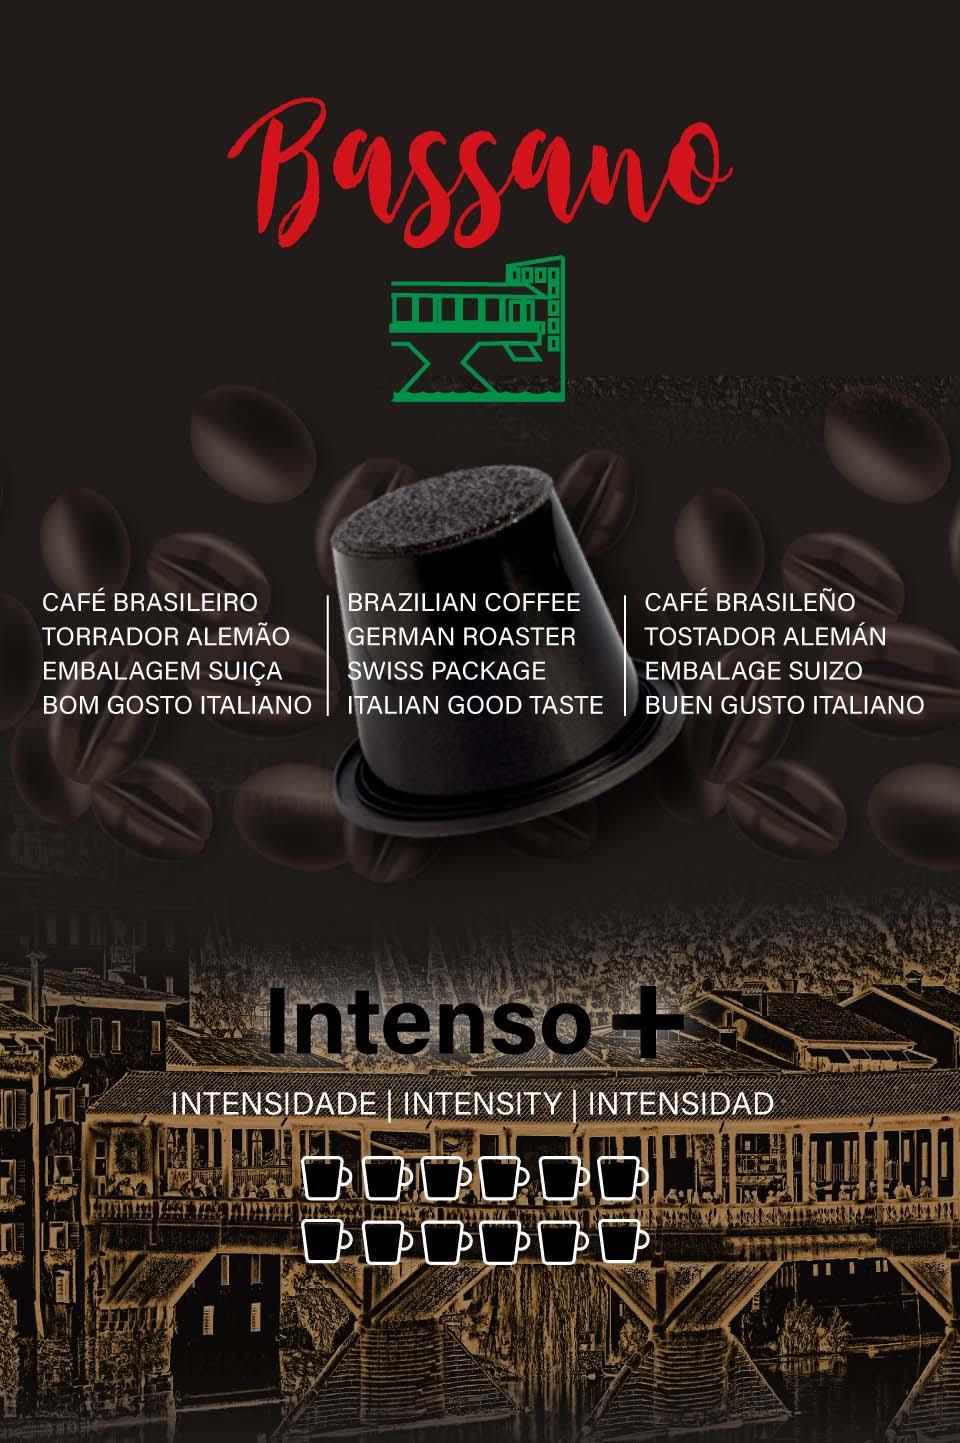 Café Bassano - Intenso +